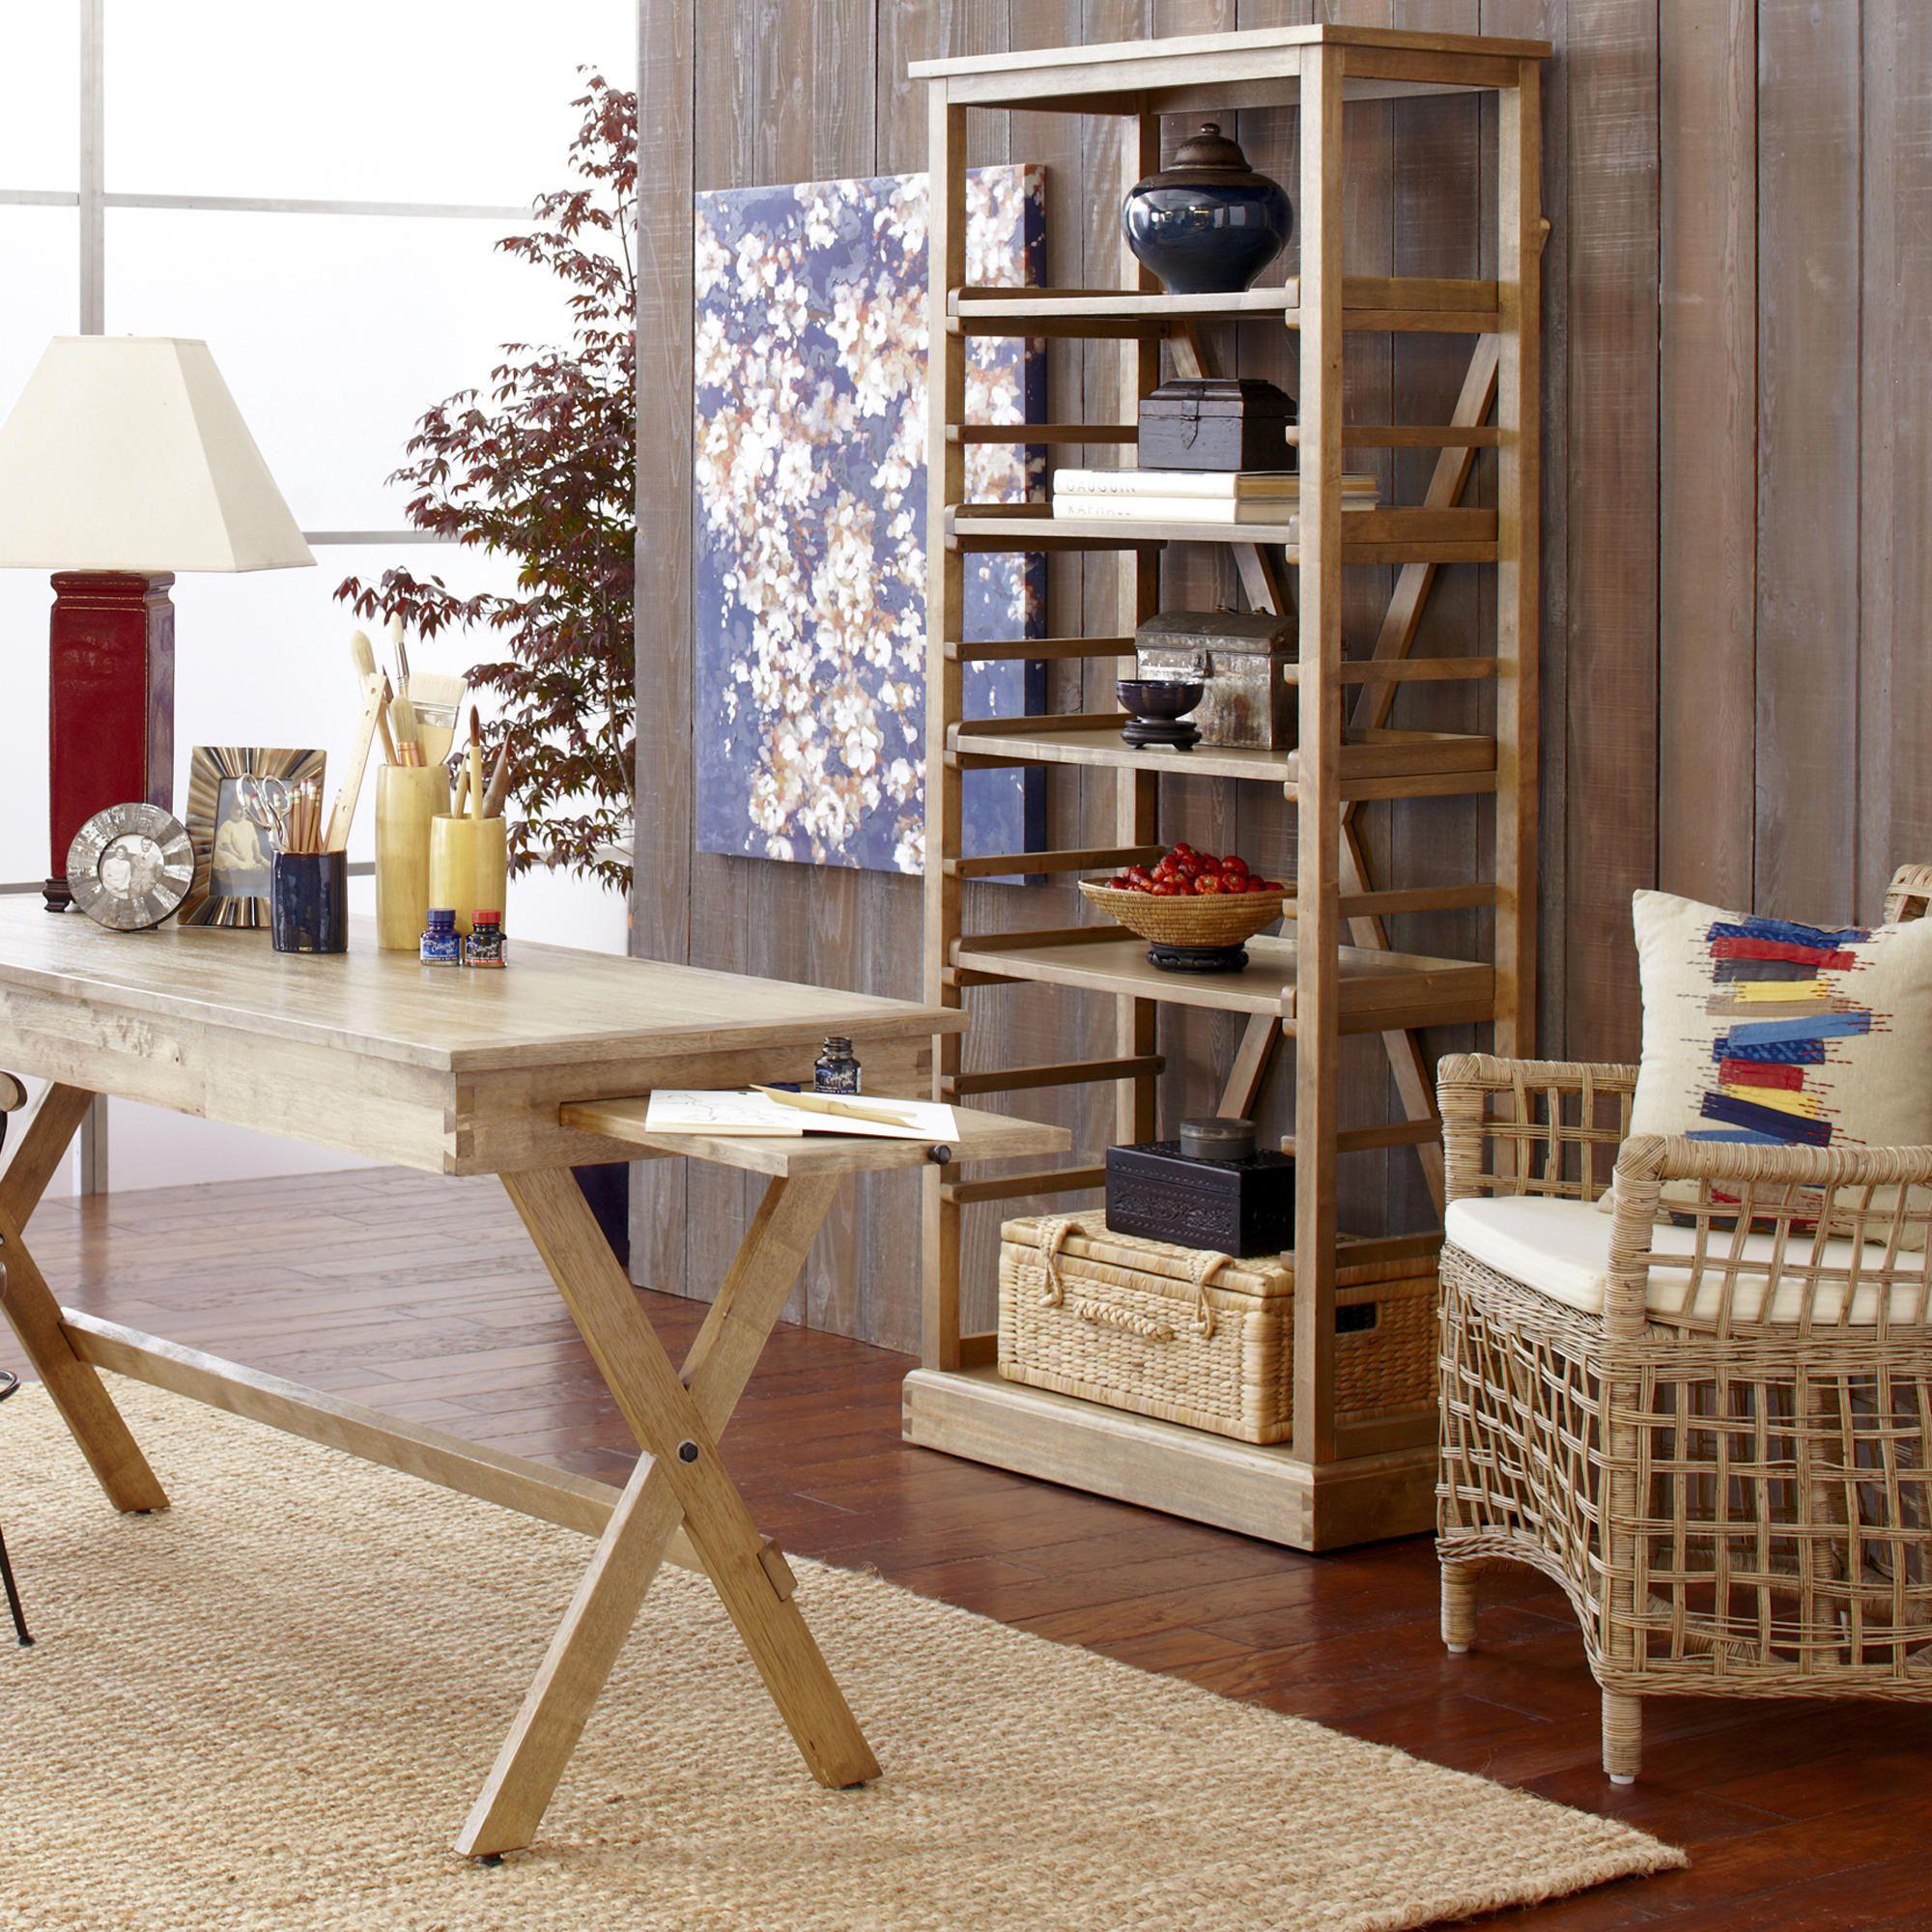 Campaign Bookshelf World Market Home Goods Decor Campaign